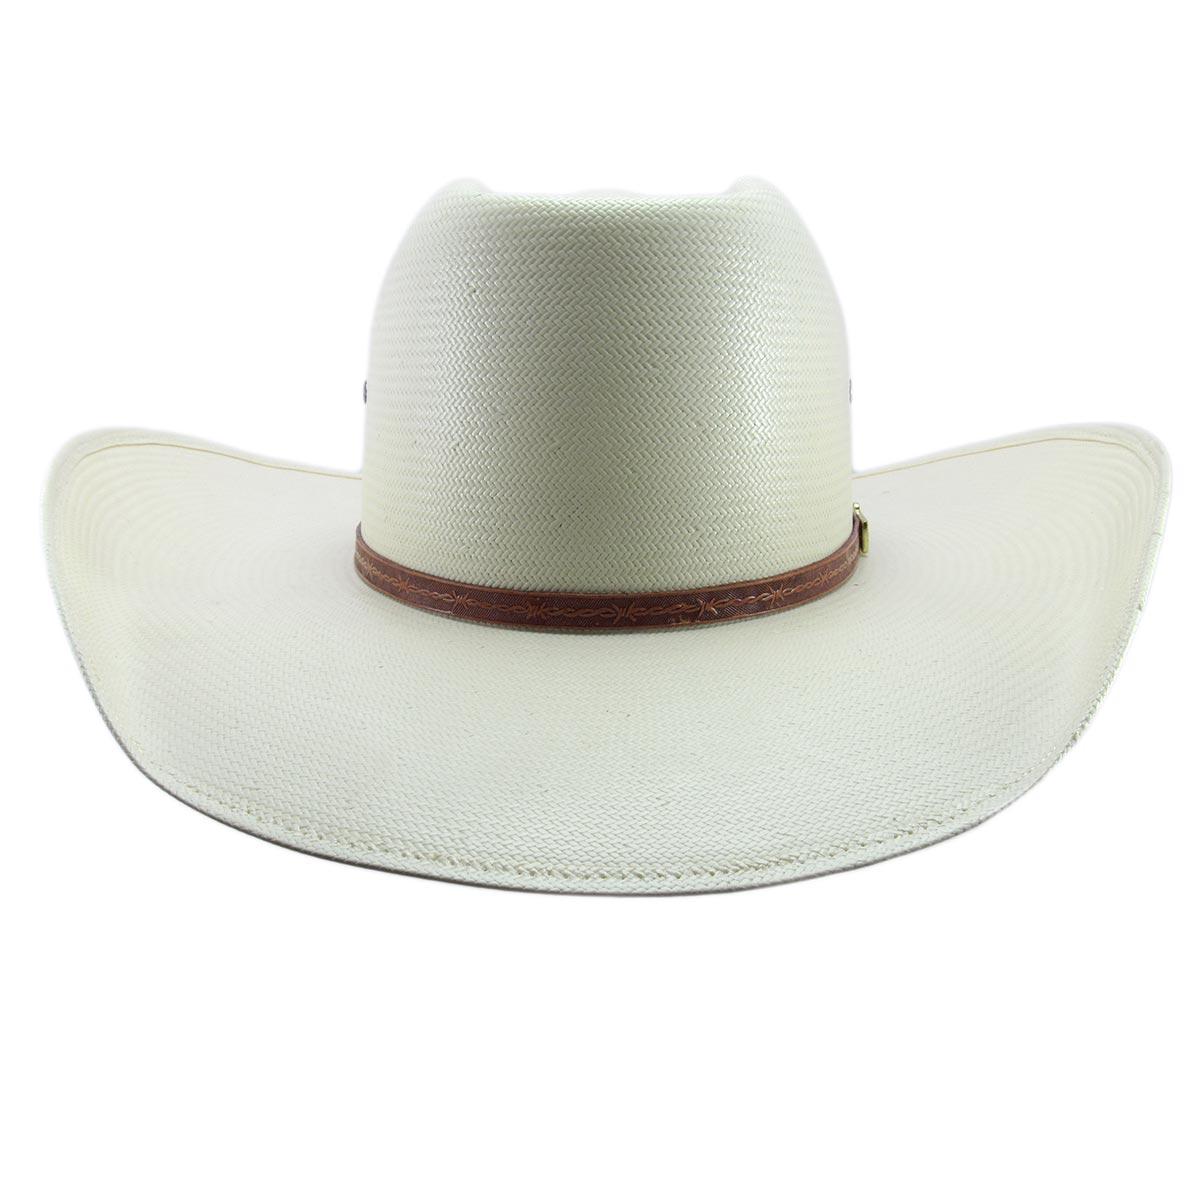 Chapéu 20x Country Pro-rodeo Shantung Aba 11 Eldorado - 9290 - Cowboy BR 6835aafaf1b